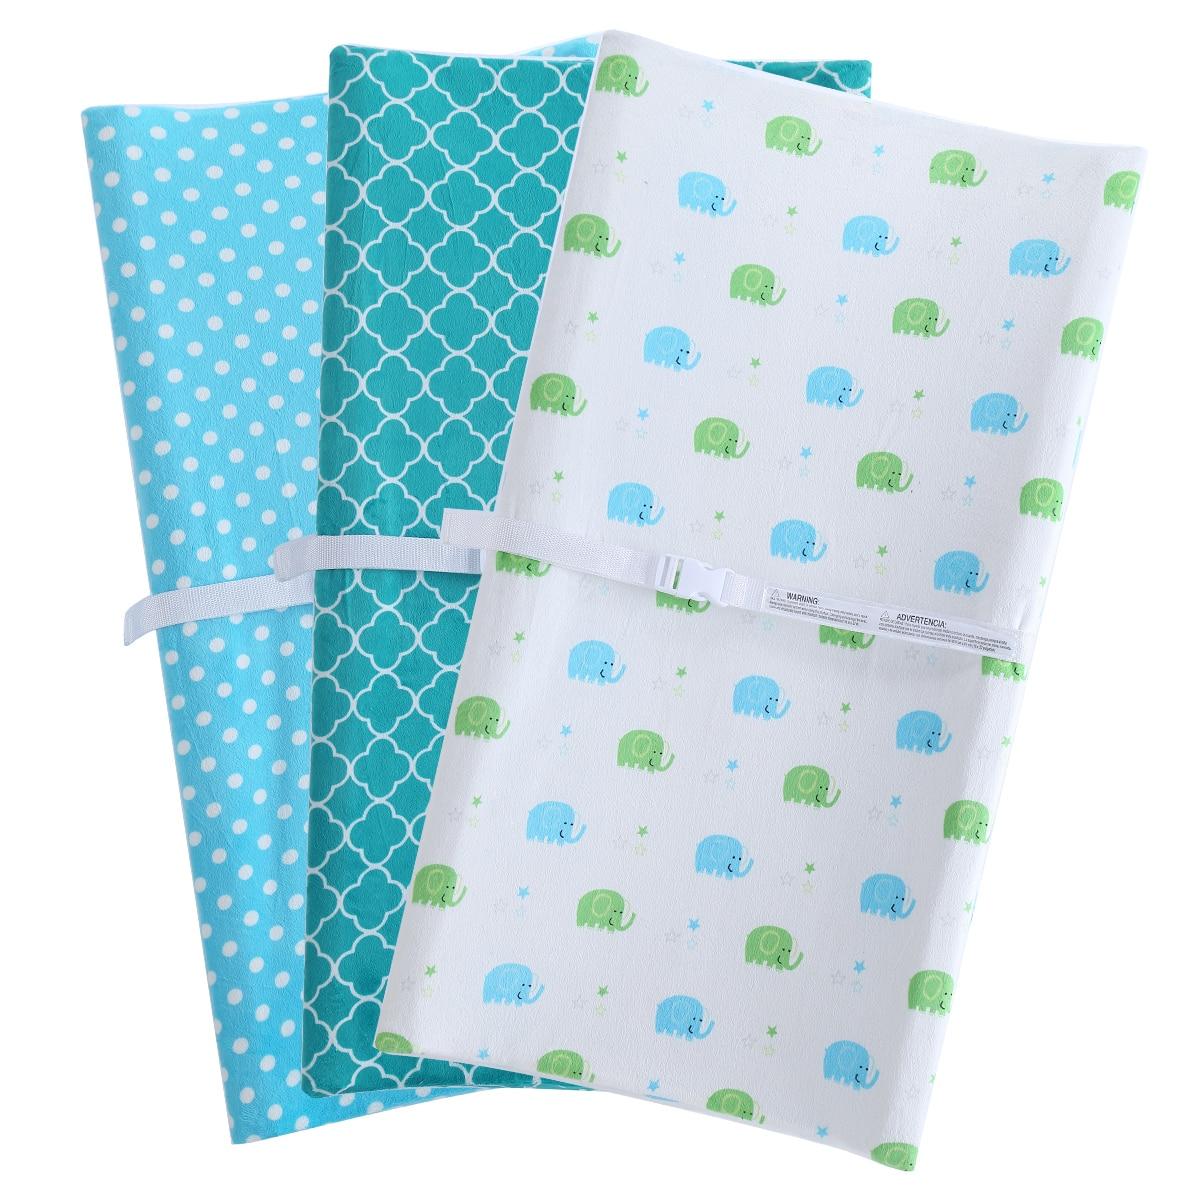 New Baby Change Mat Newborn Waterproof Urine Pad Cartoon Breathable Diaper Pad